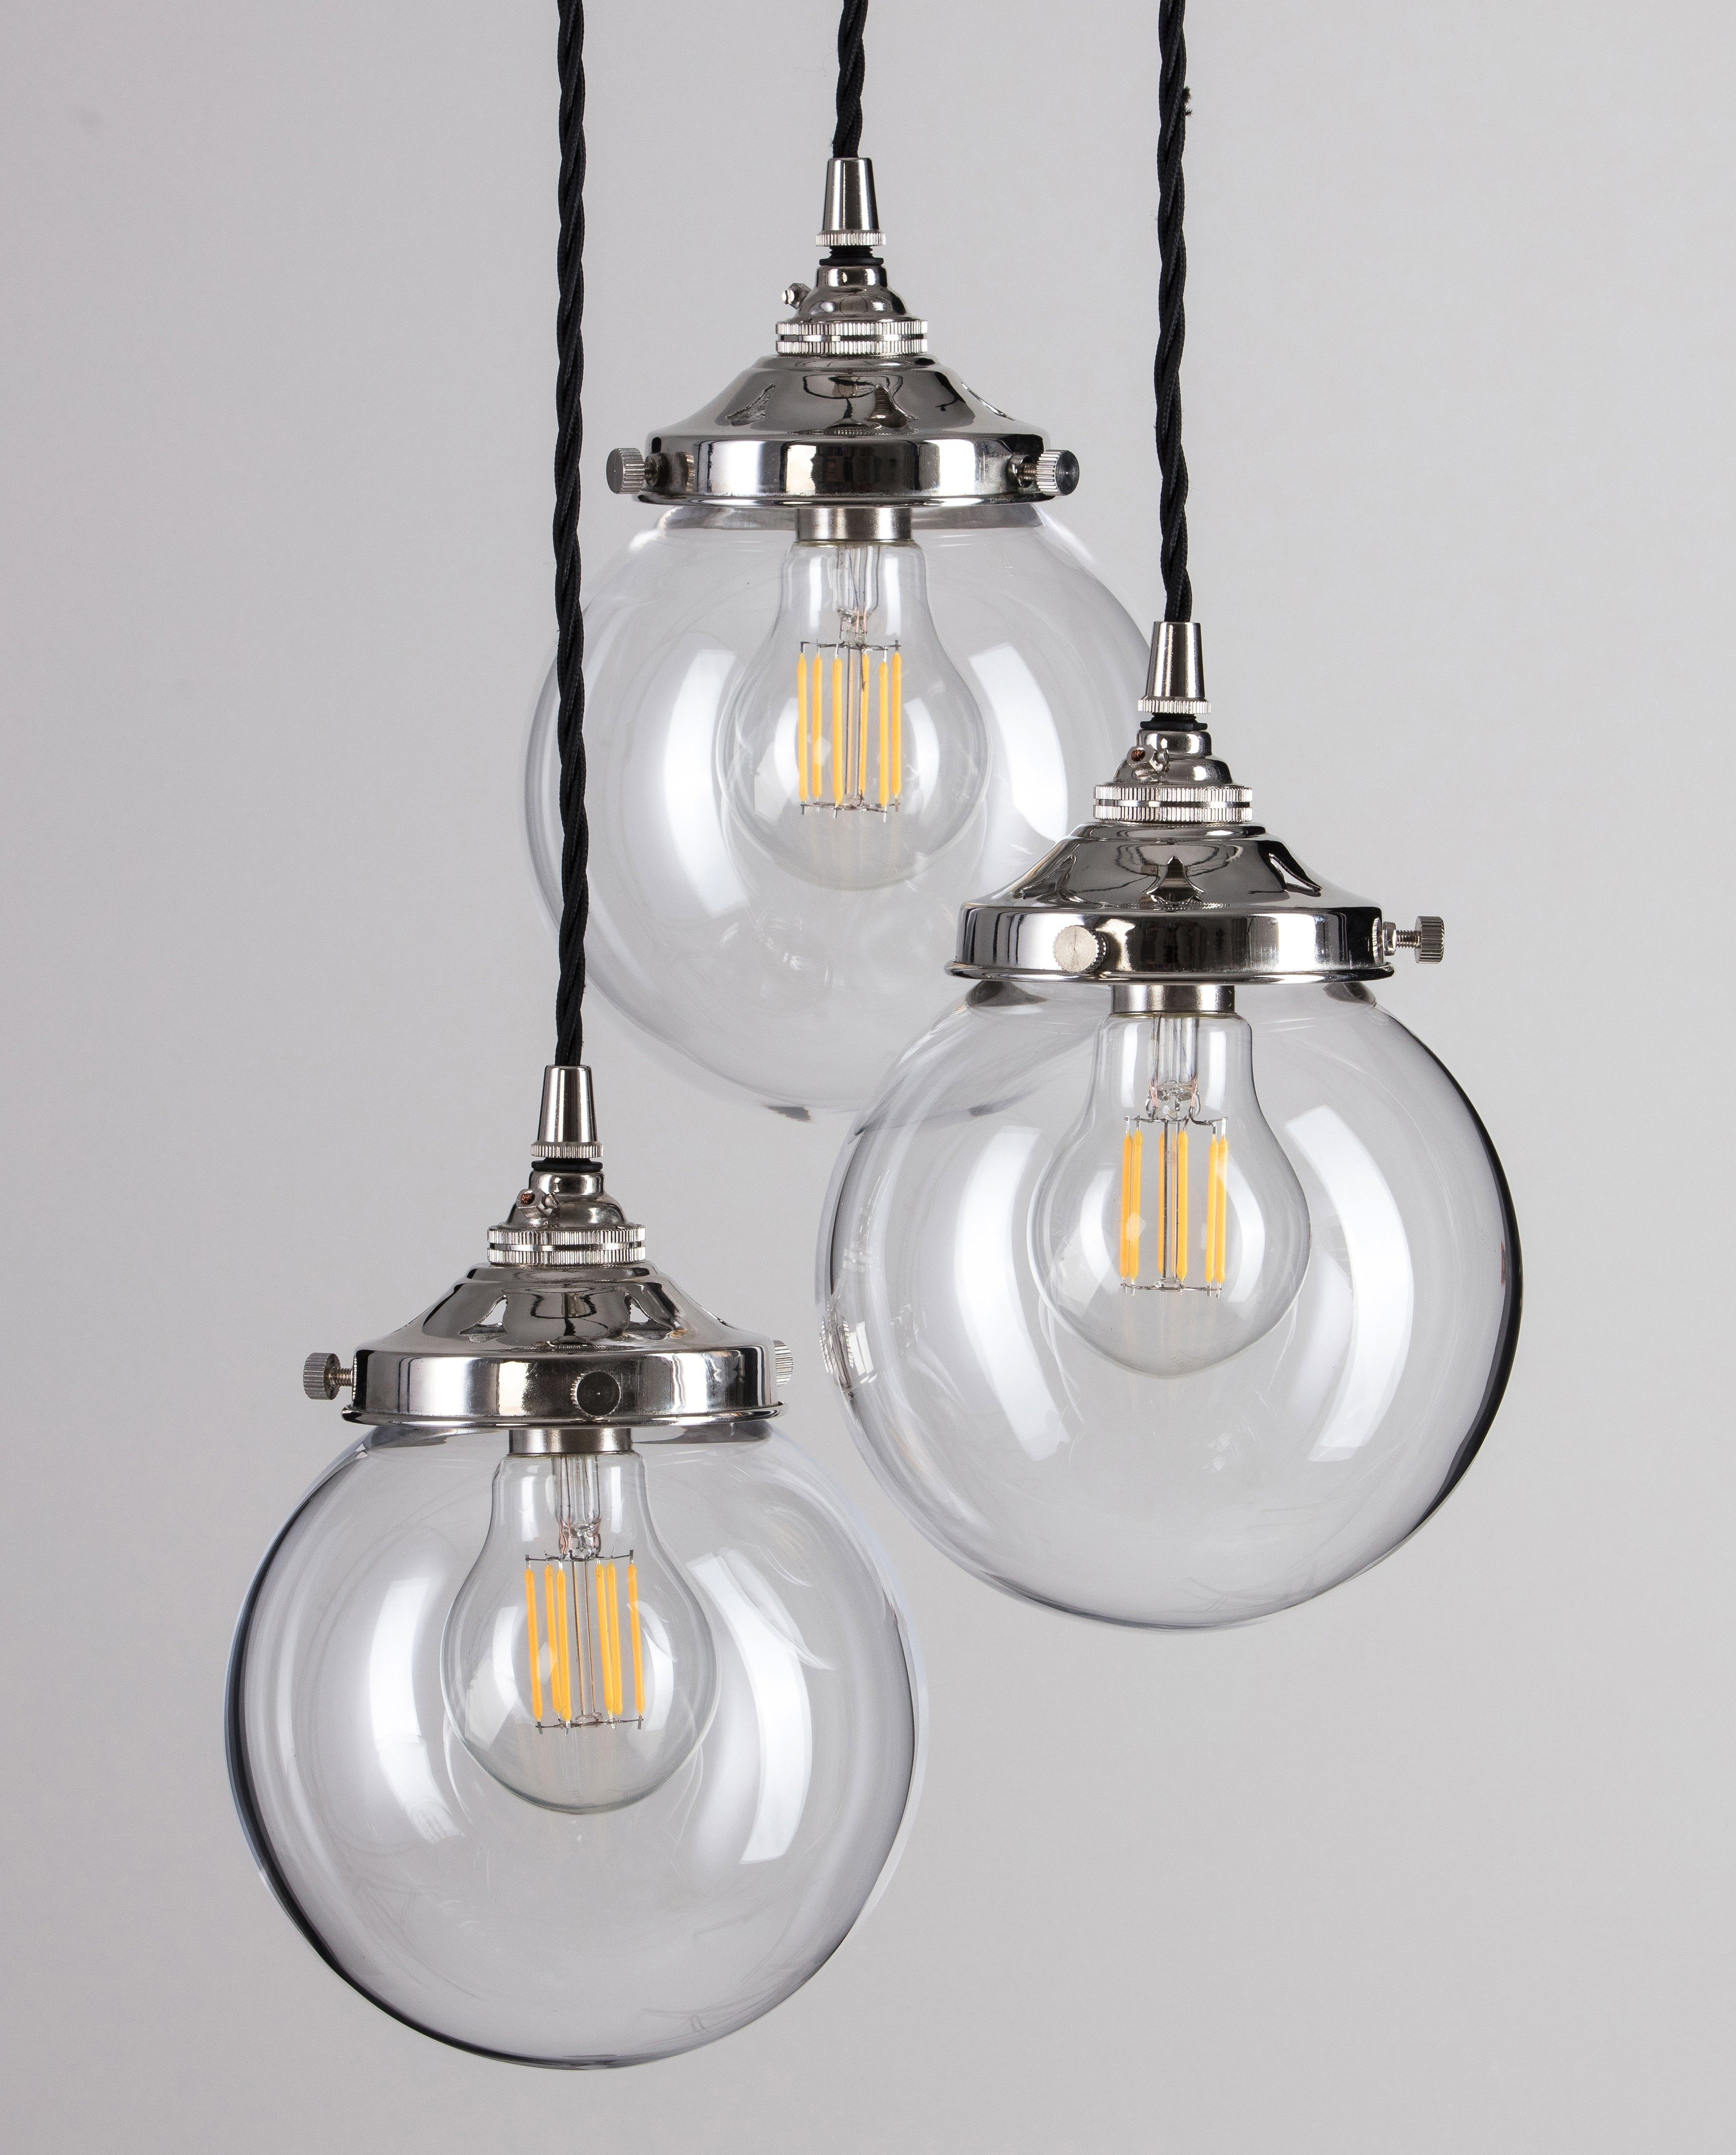 Glass Globe Cluster Pendant Light - Antique Silver